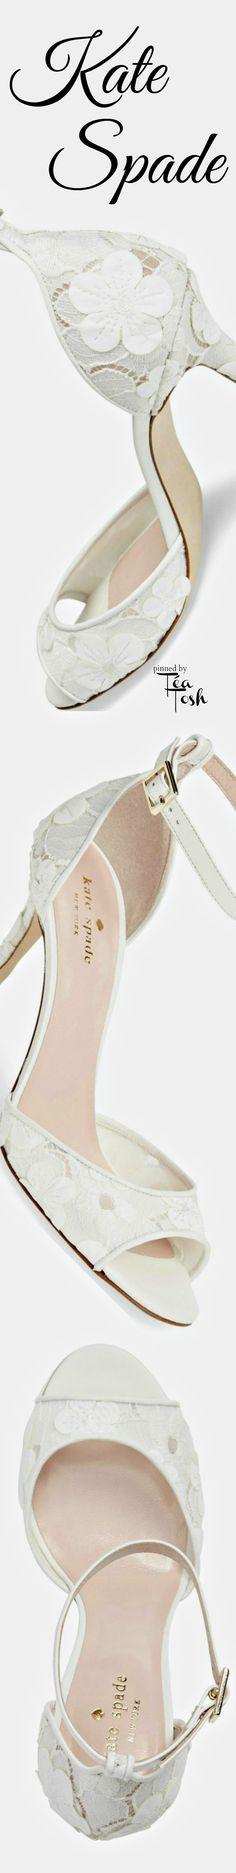 Shoes sandals wedding ❇Téa Tosh❇ kate spade